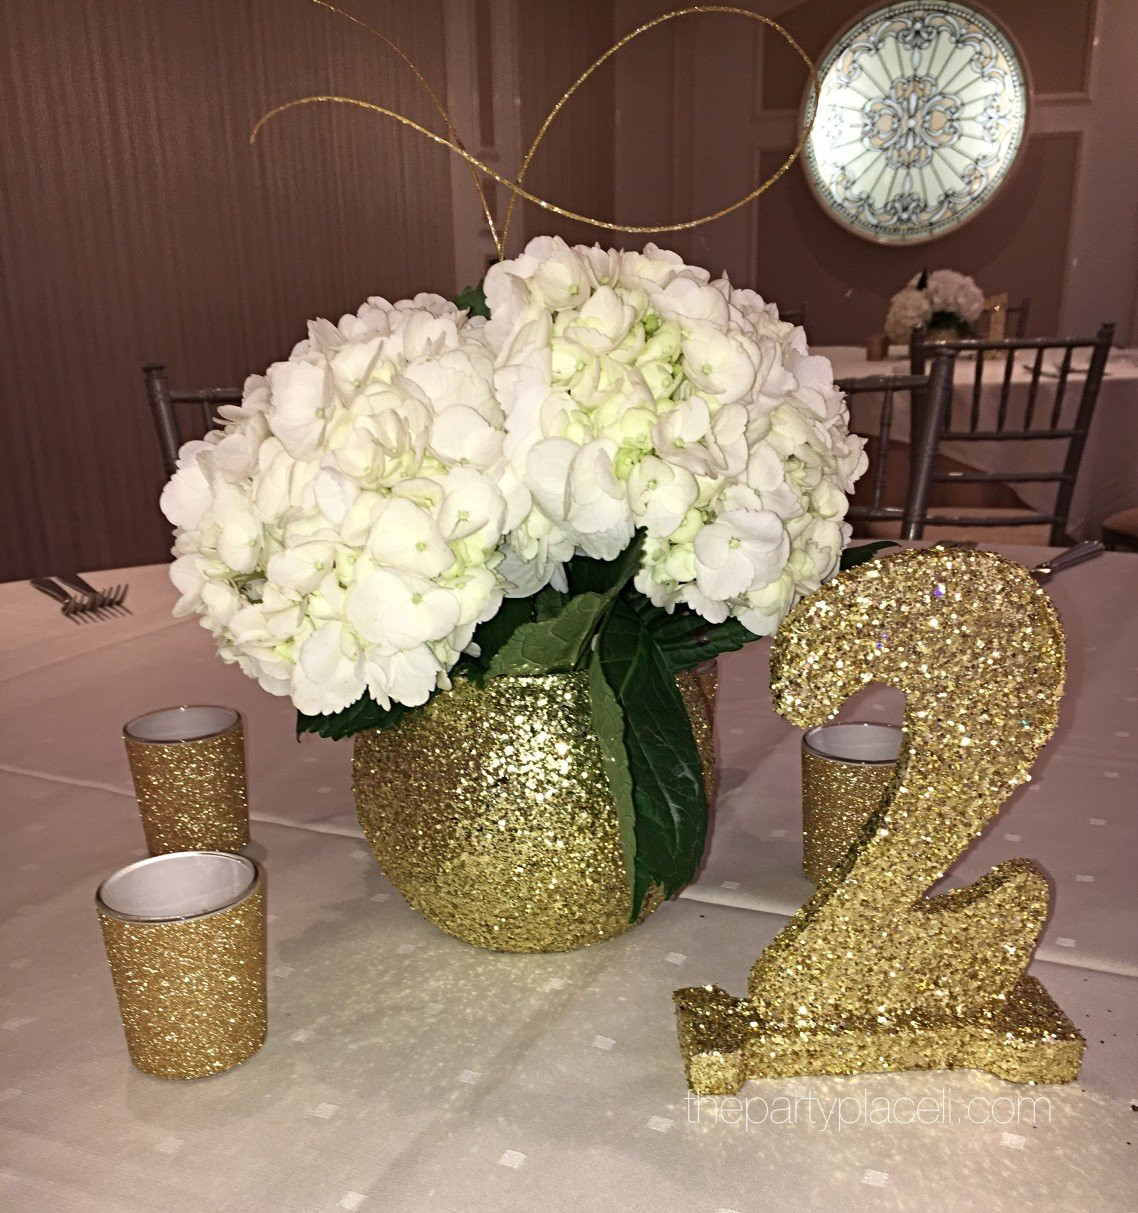 Gold Glitter Vase Of Glitter Vase Centerpiece Vase and Cellar Image Avorcor Com for White and Gold Glitter Vase Centerpiece Centerpieces the Party Place Li Specias